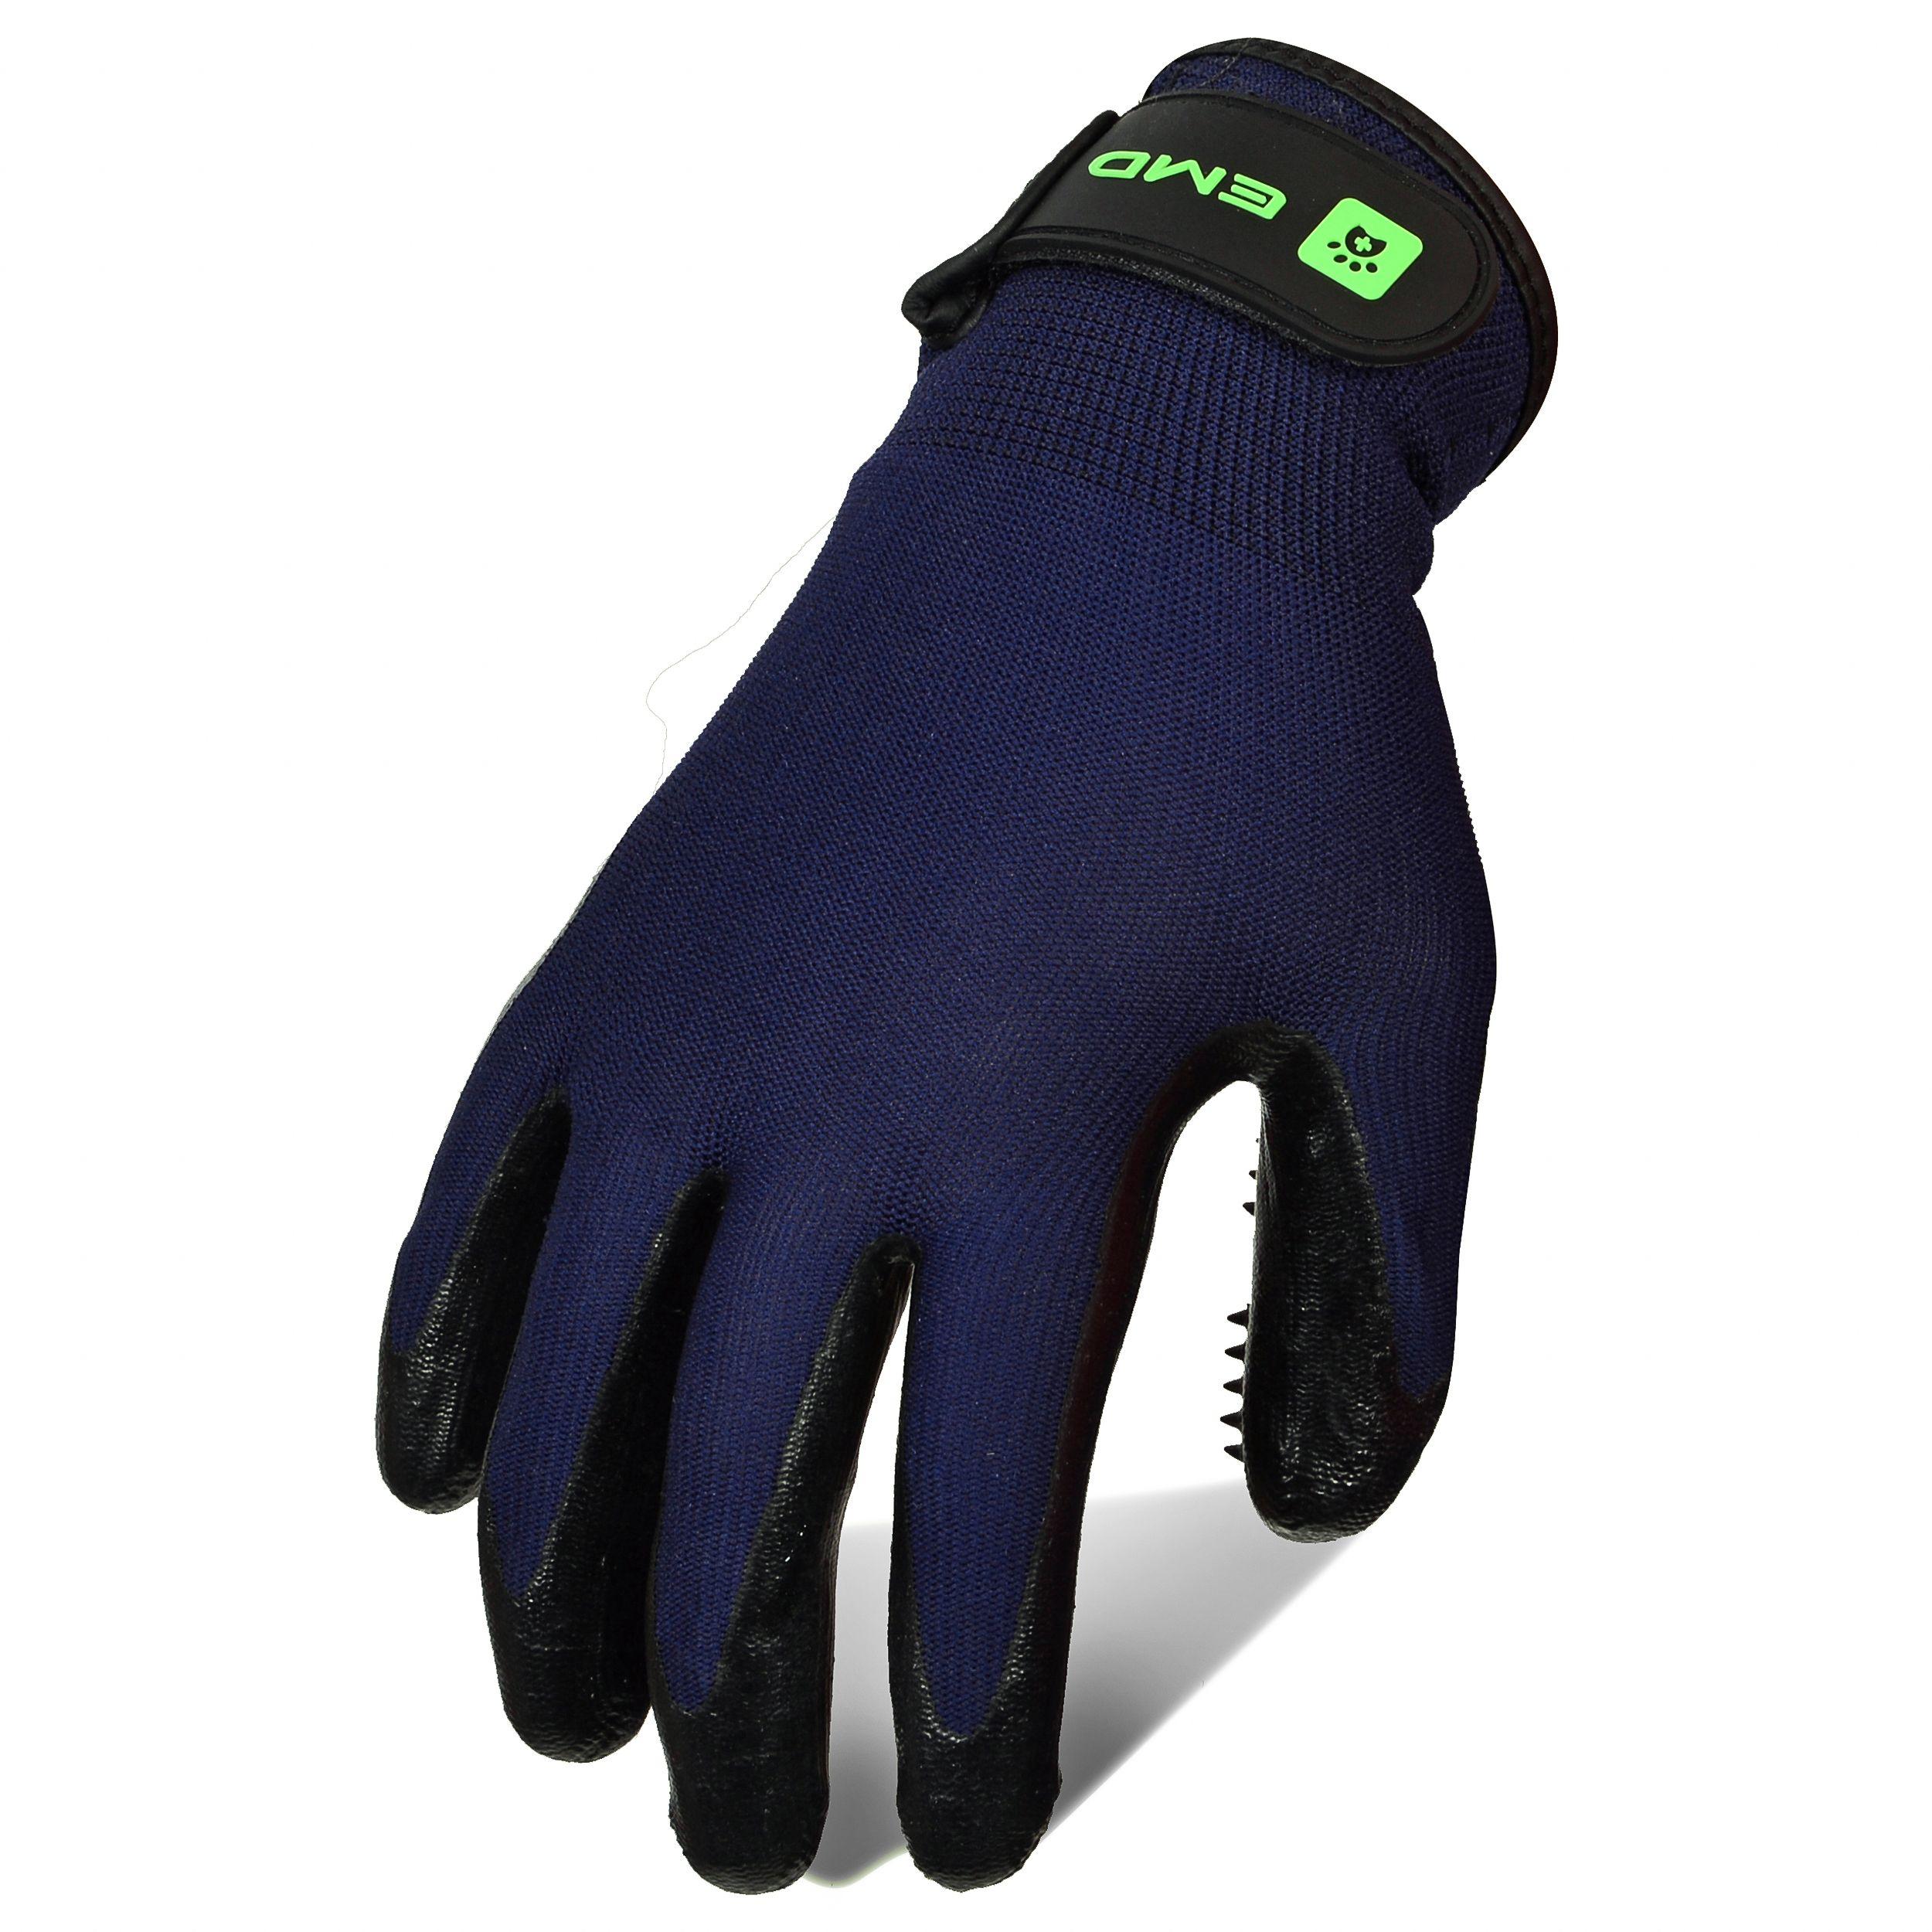 Pet Shedding Glove Shopping Deal NYC Pet shed, Pet